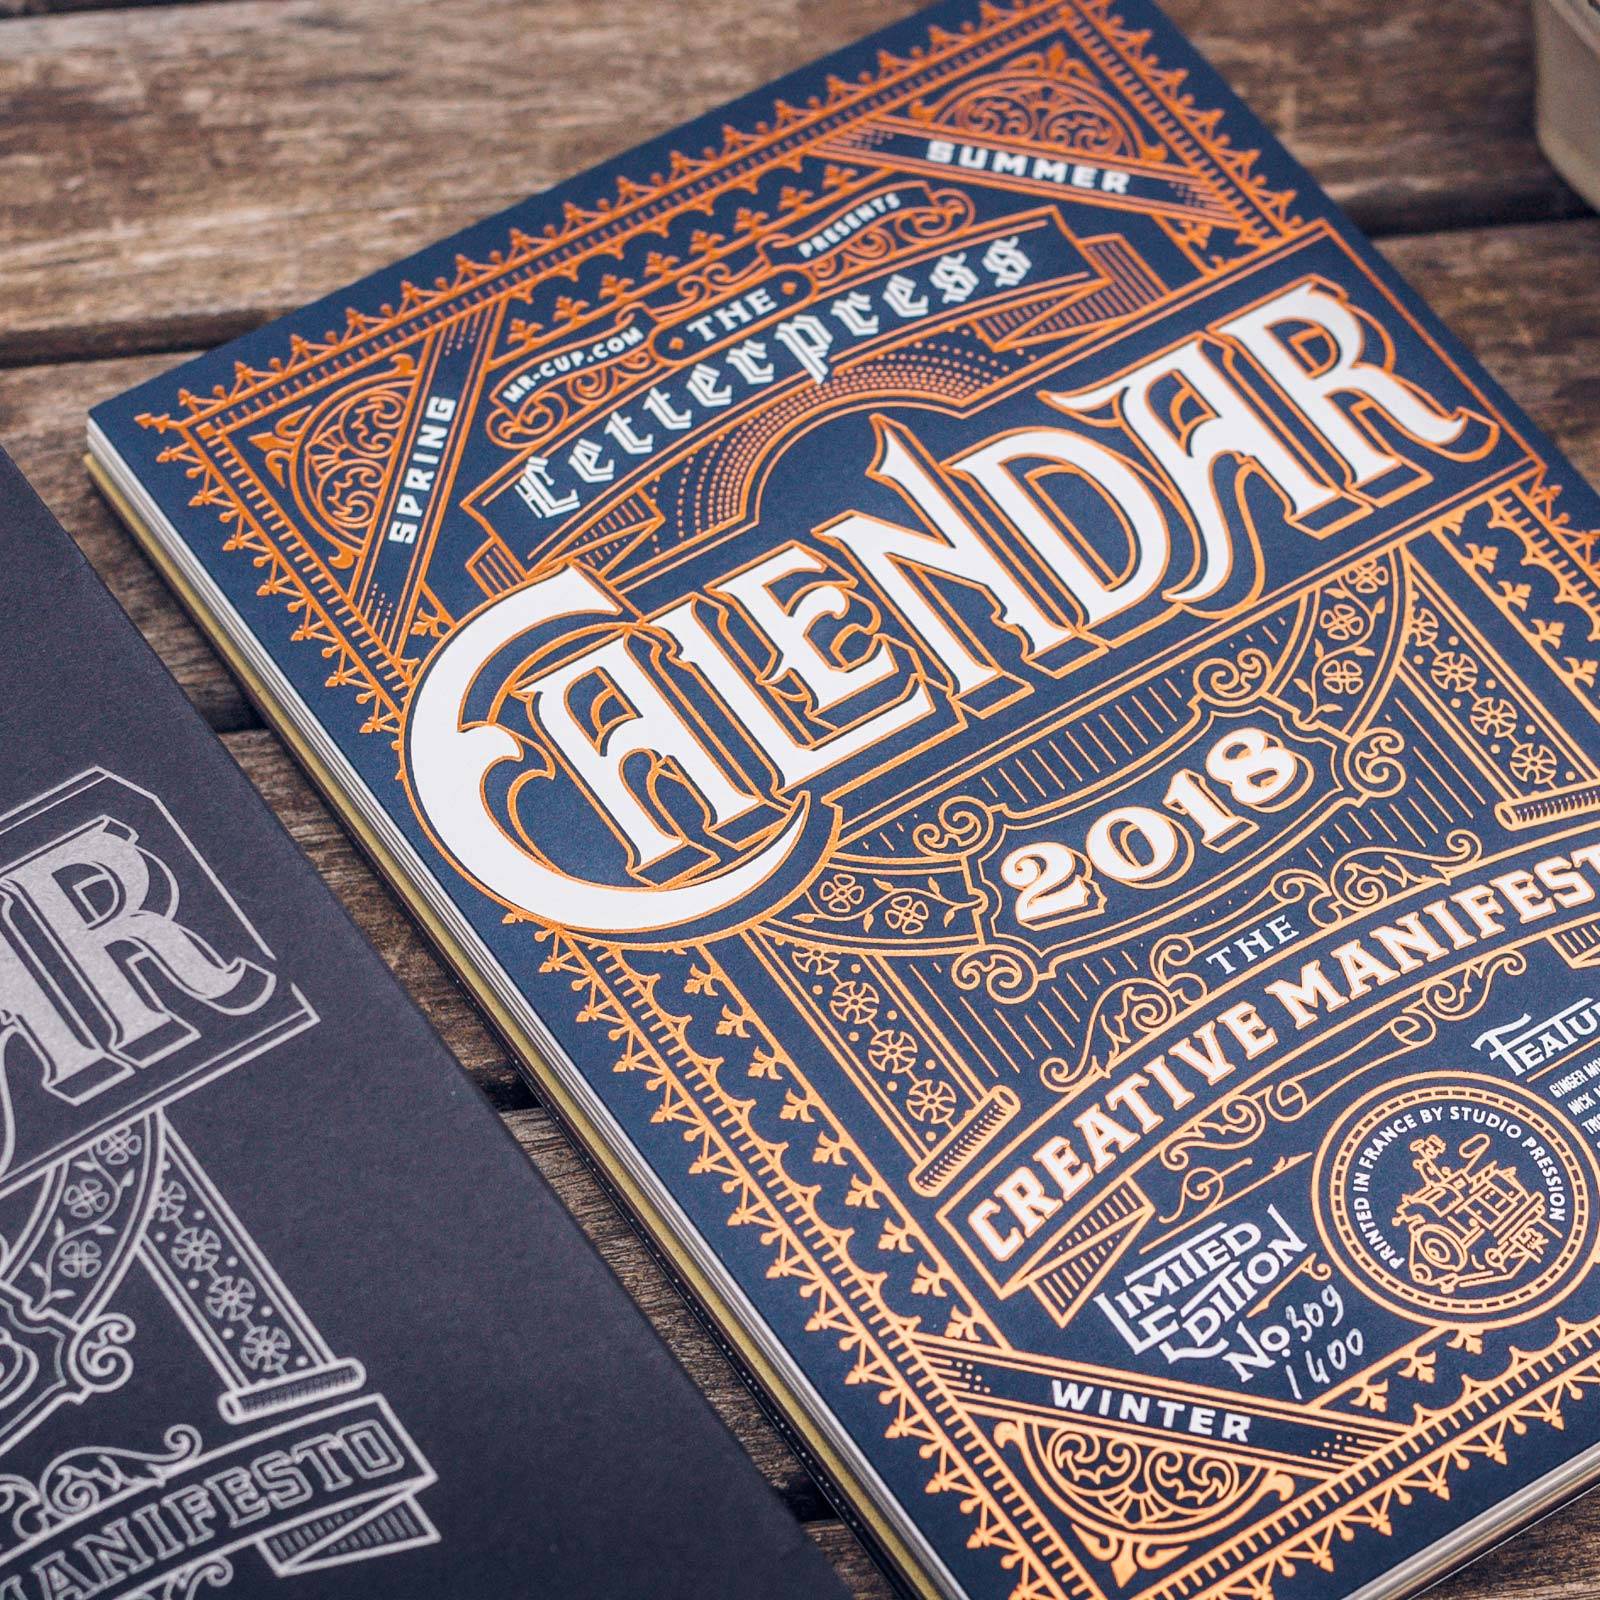 Calendrier letterpress 2018